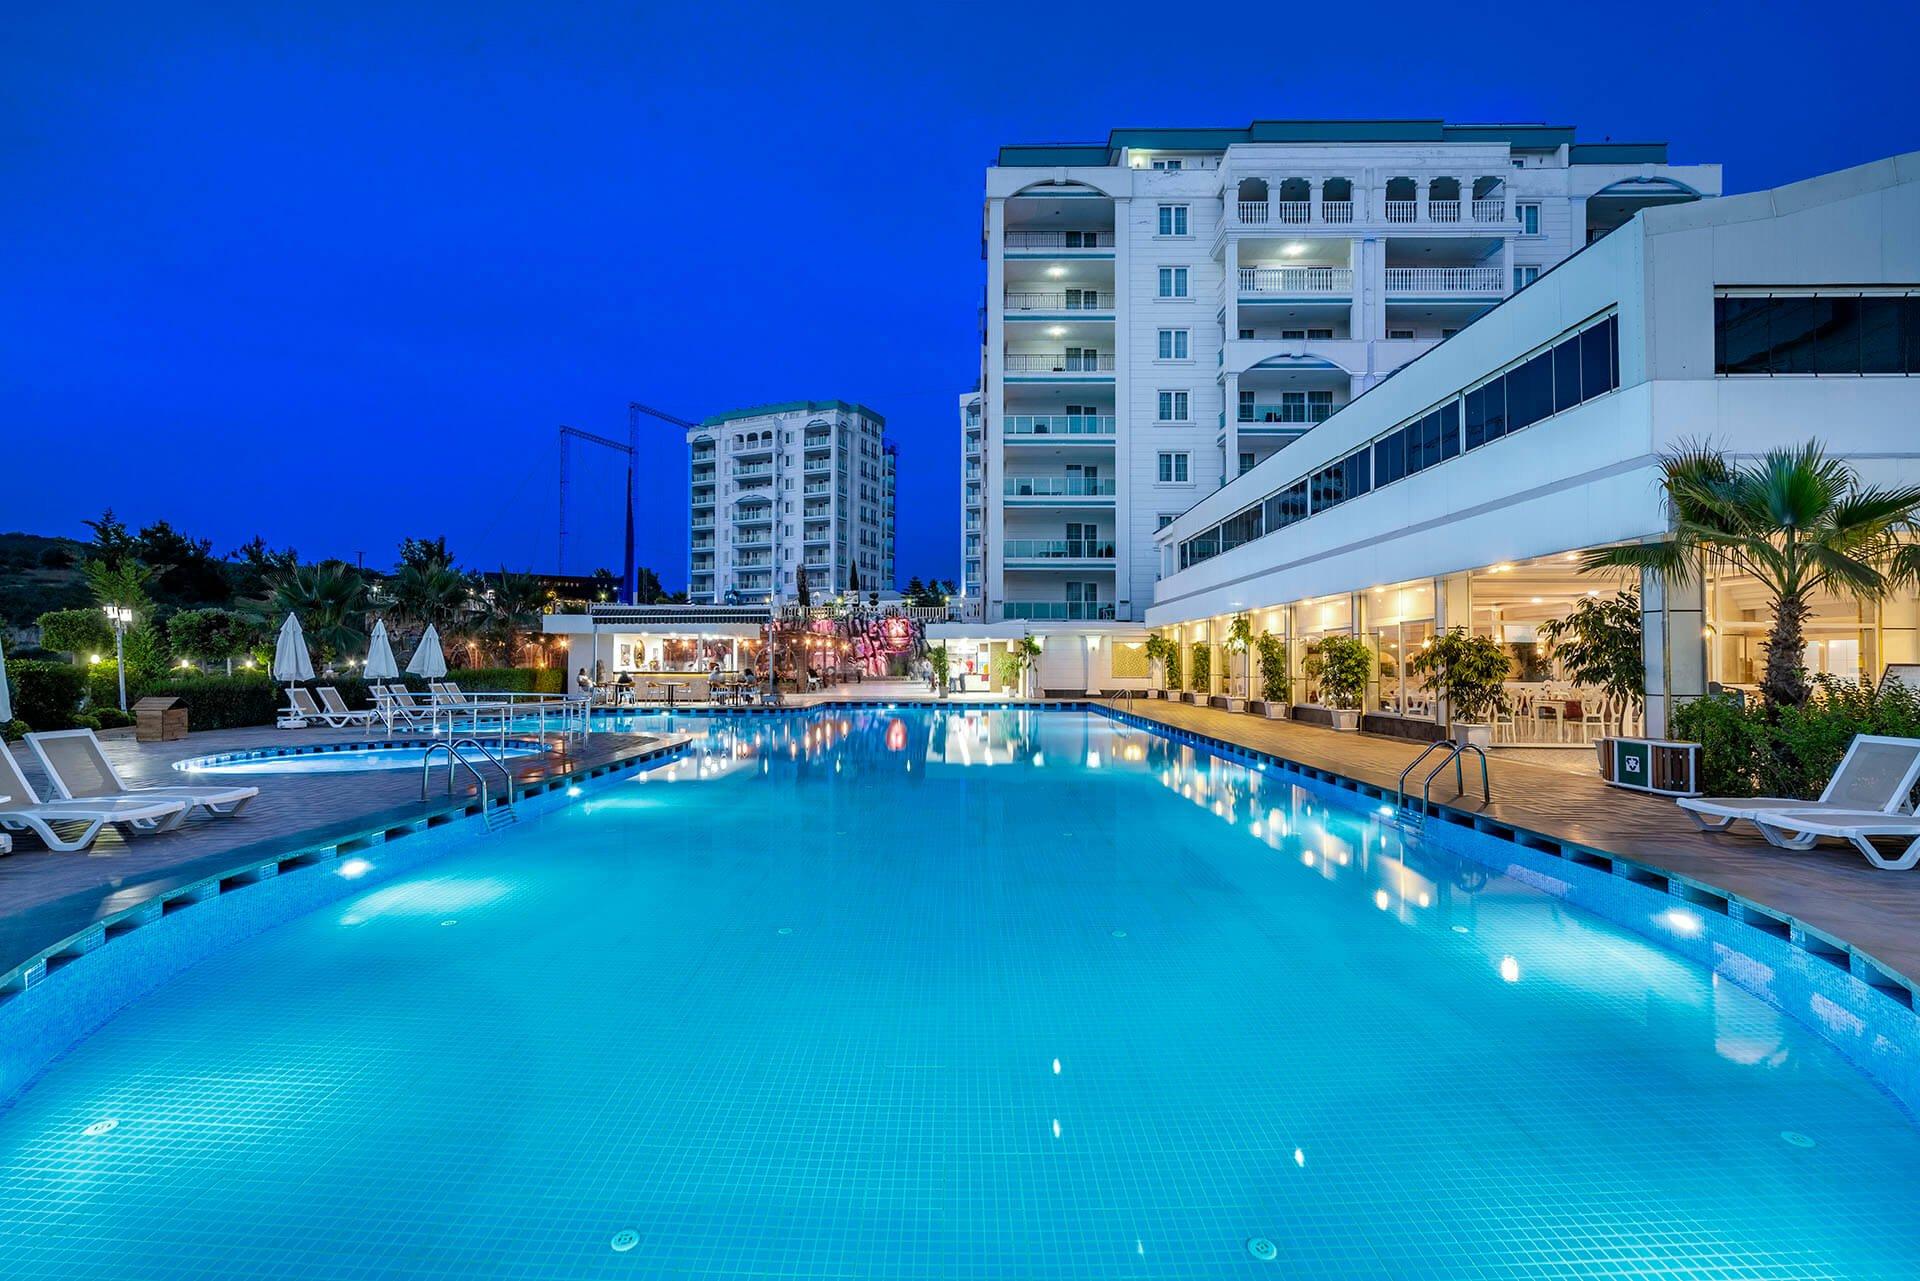 , Modern Saraylar Halal Hotel&SPA İslami Otel Tatil Köyü